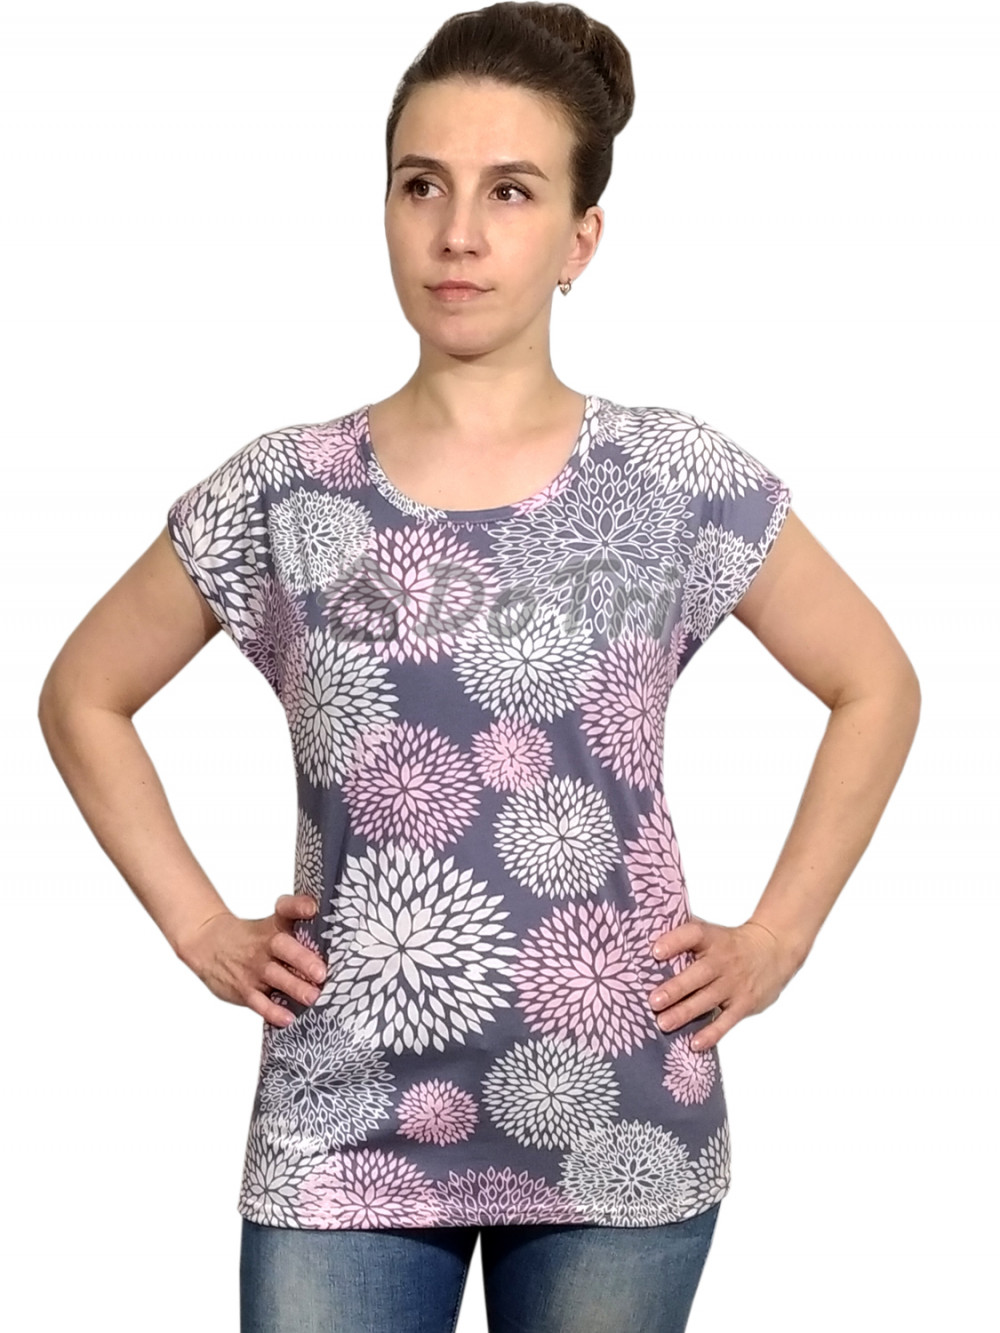 Увеличить - Блузка «Прима» арт 048 одуванчики